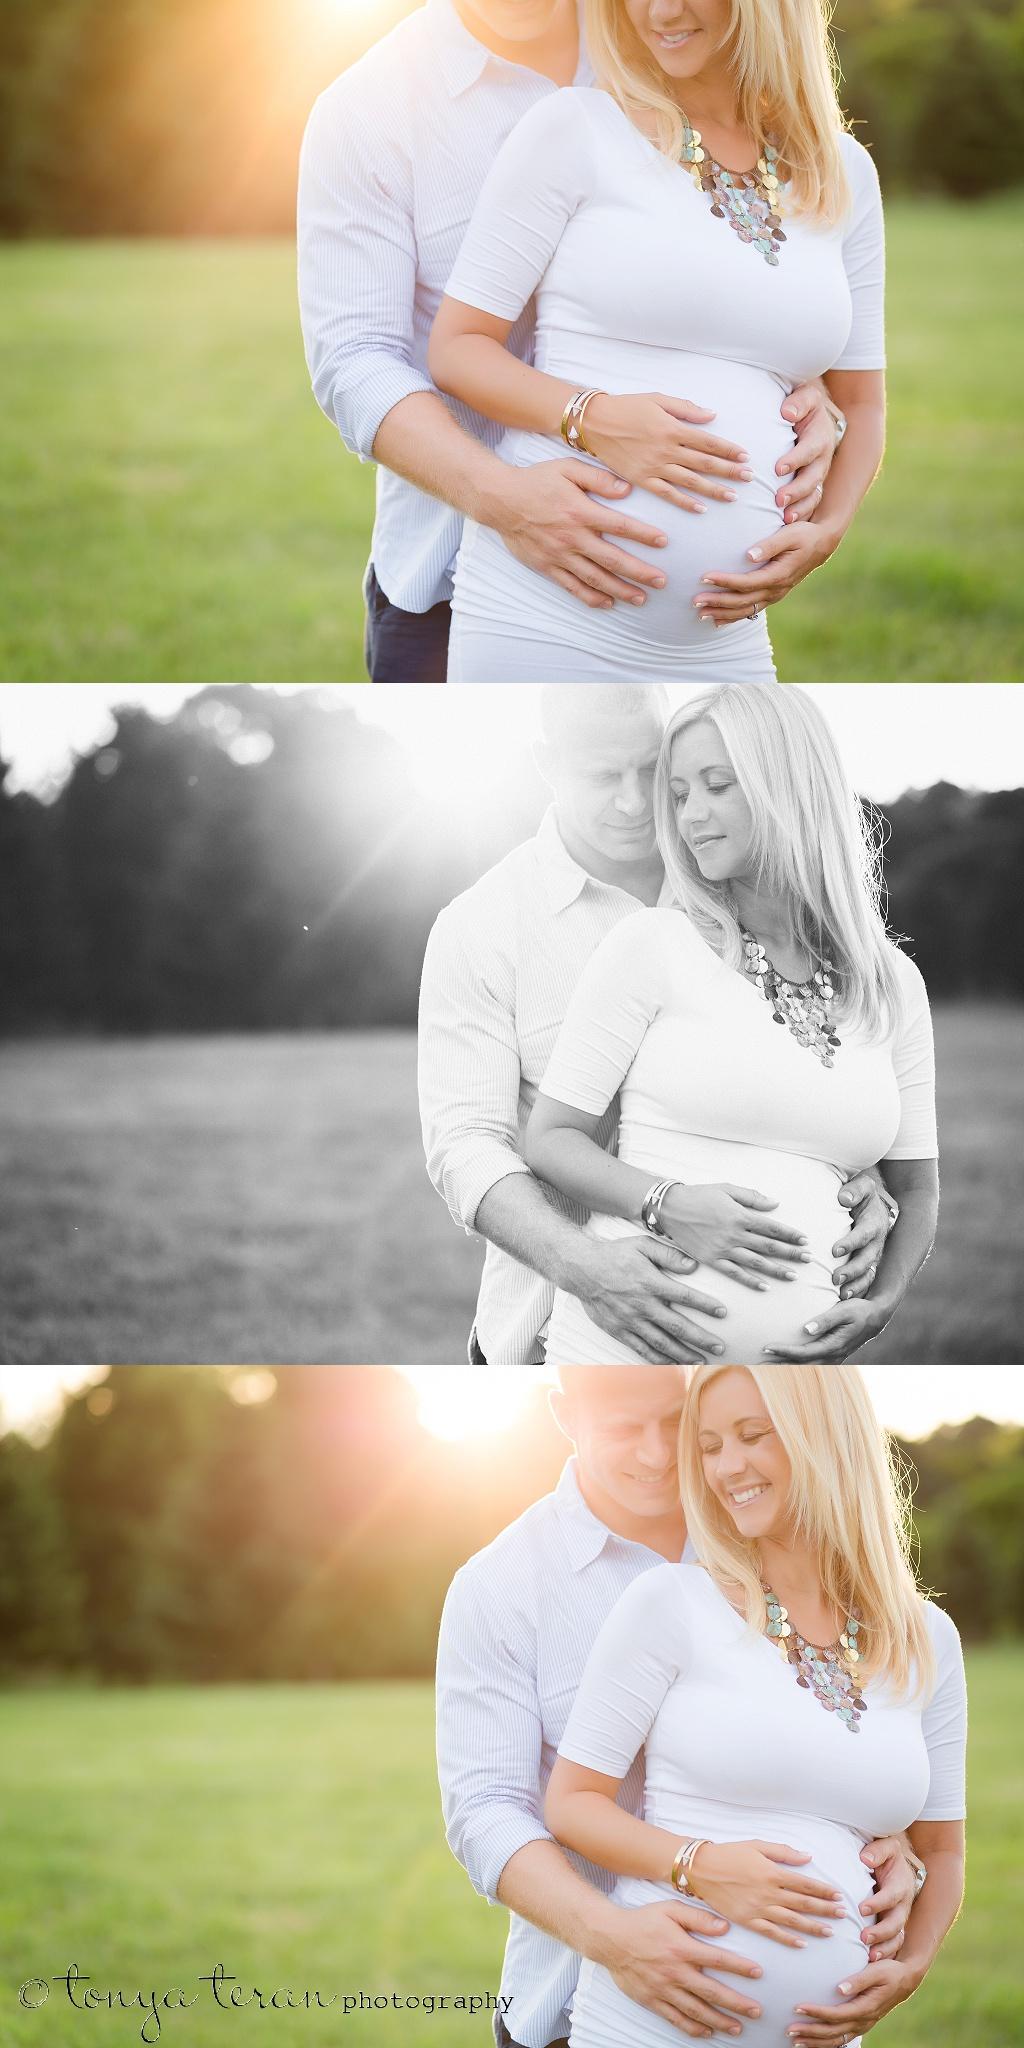 Mini Maternity Photo Session | Tonya Teran Photography, Chevy Chase, MD Newborn, Baby, and Family Photographer